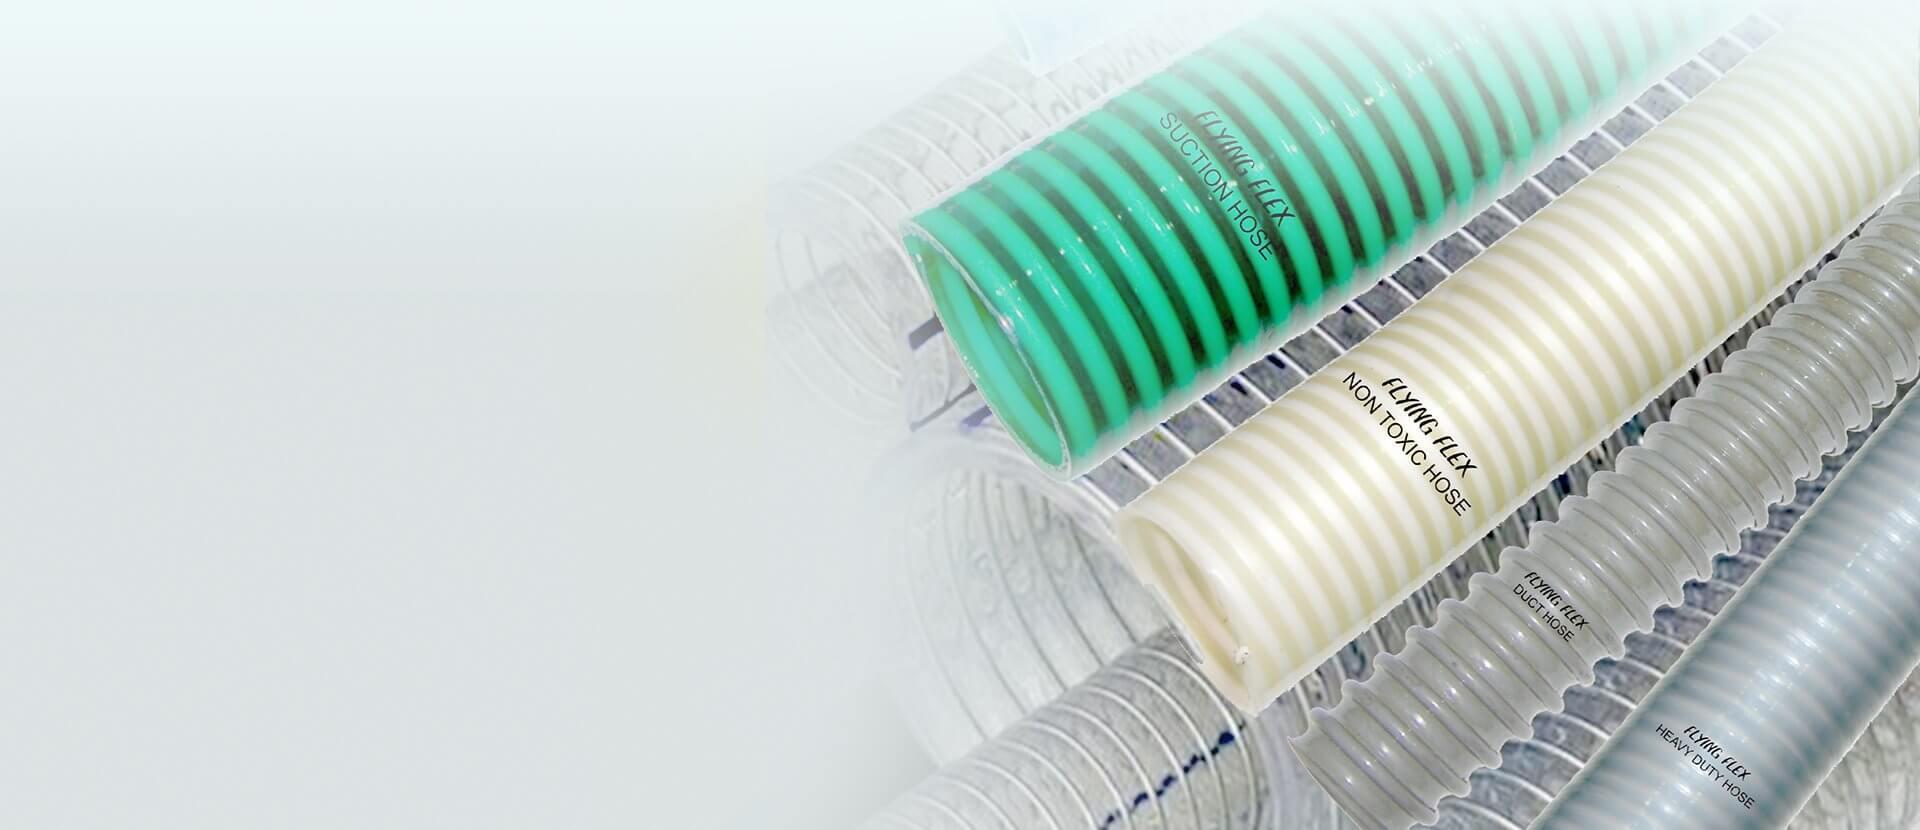 PVC Flexible Hose Pipes